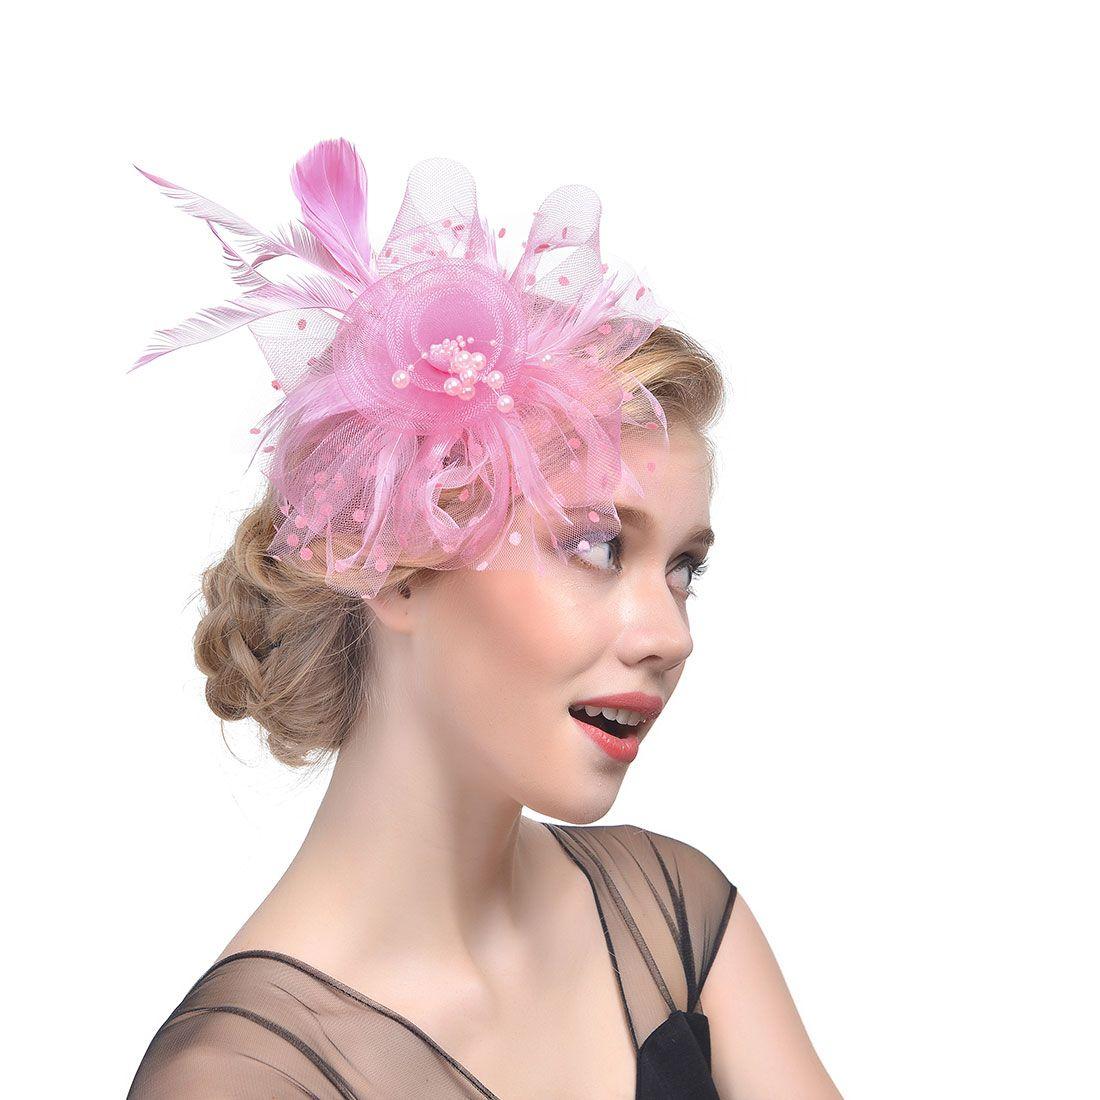 0e7cf75b Feathers Tulle Pearls Wedding Hair Accessories Bridal Hats Flora Elegant  Women's Party Hats sombreros de boda